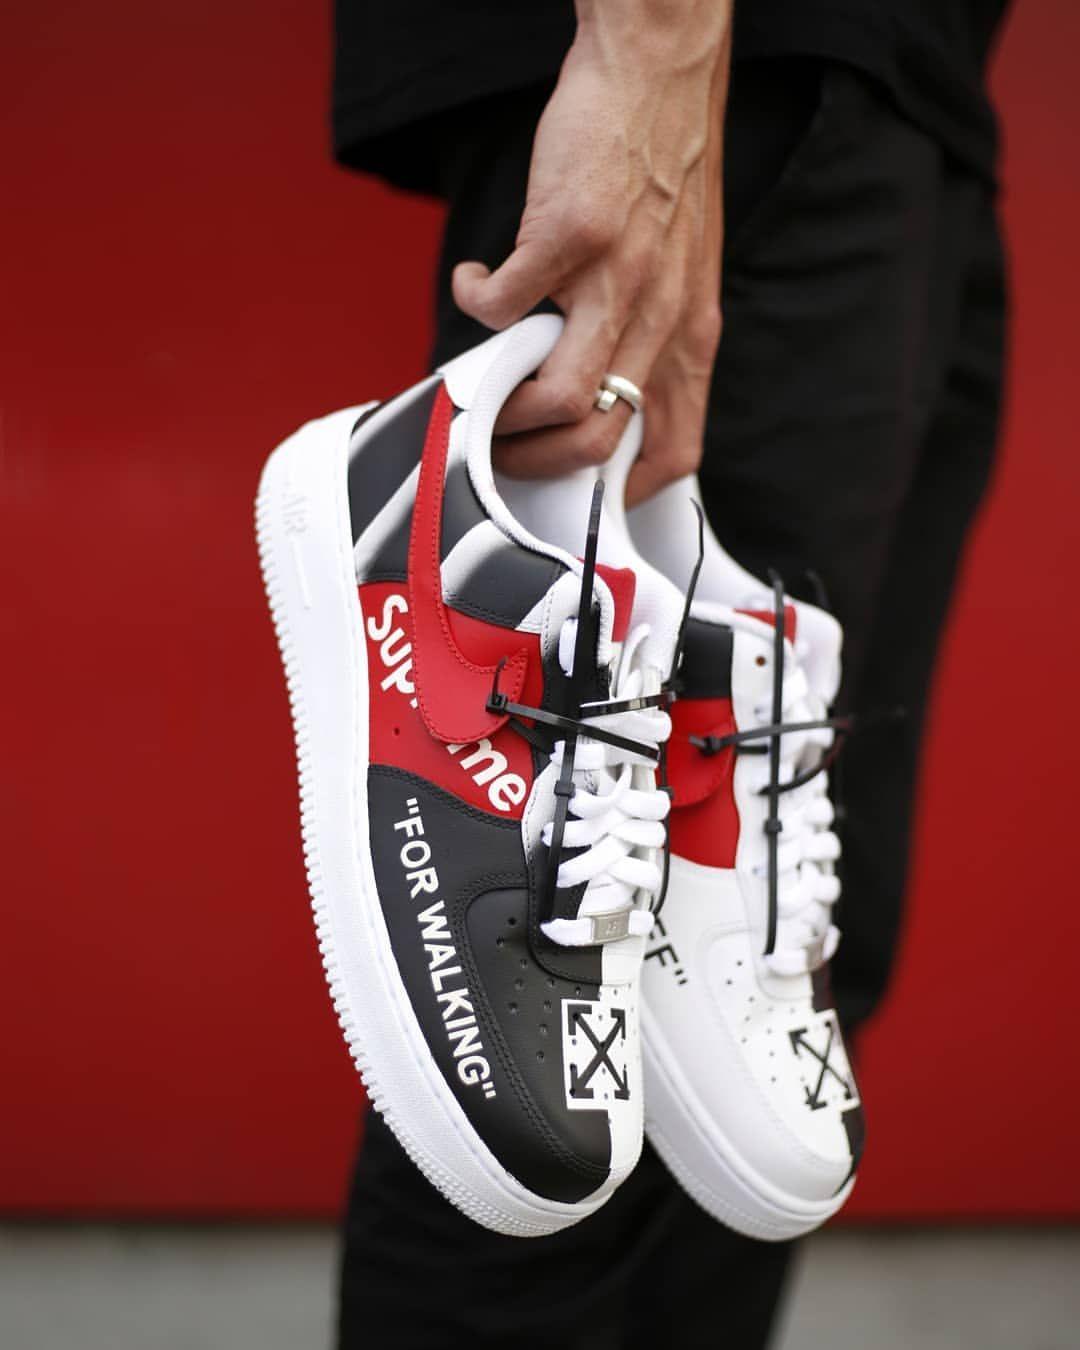 Custom sneakers, Sneakers, Fashion